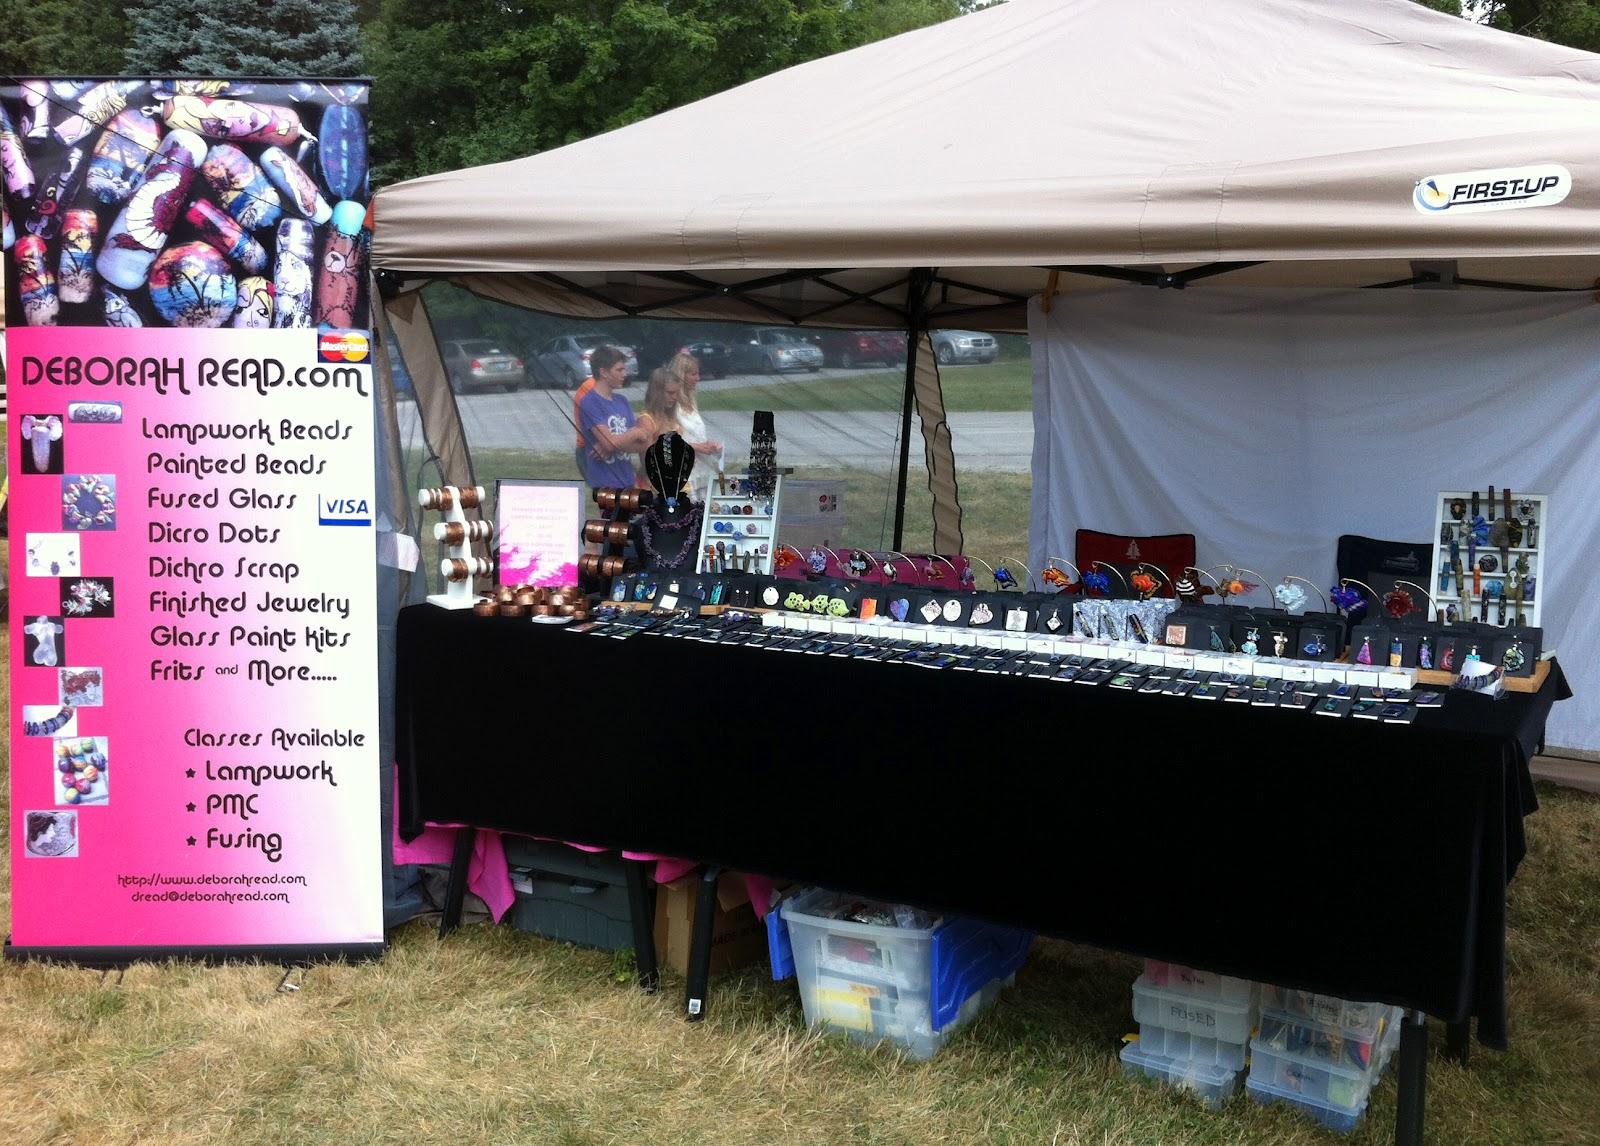 DEBORHREAD COM: Purple Turtle Festival Craft Show